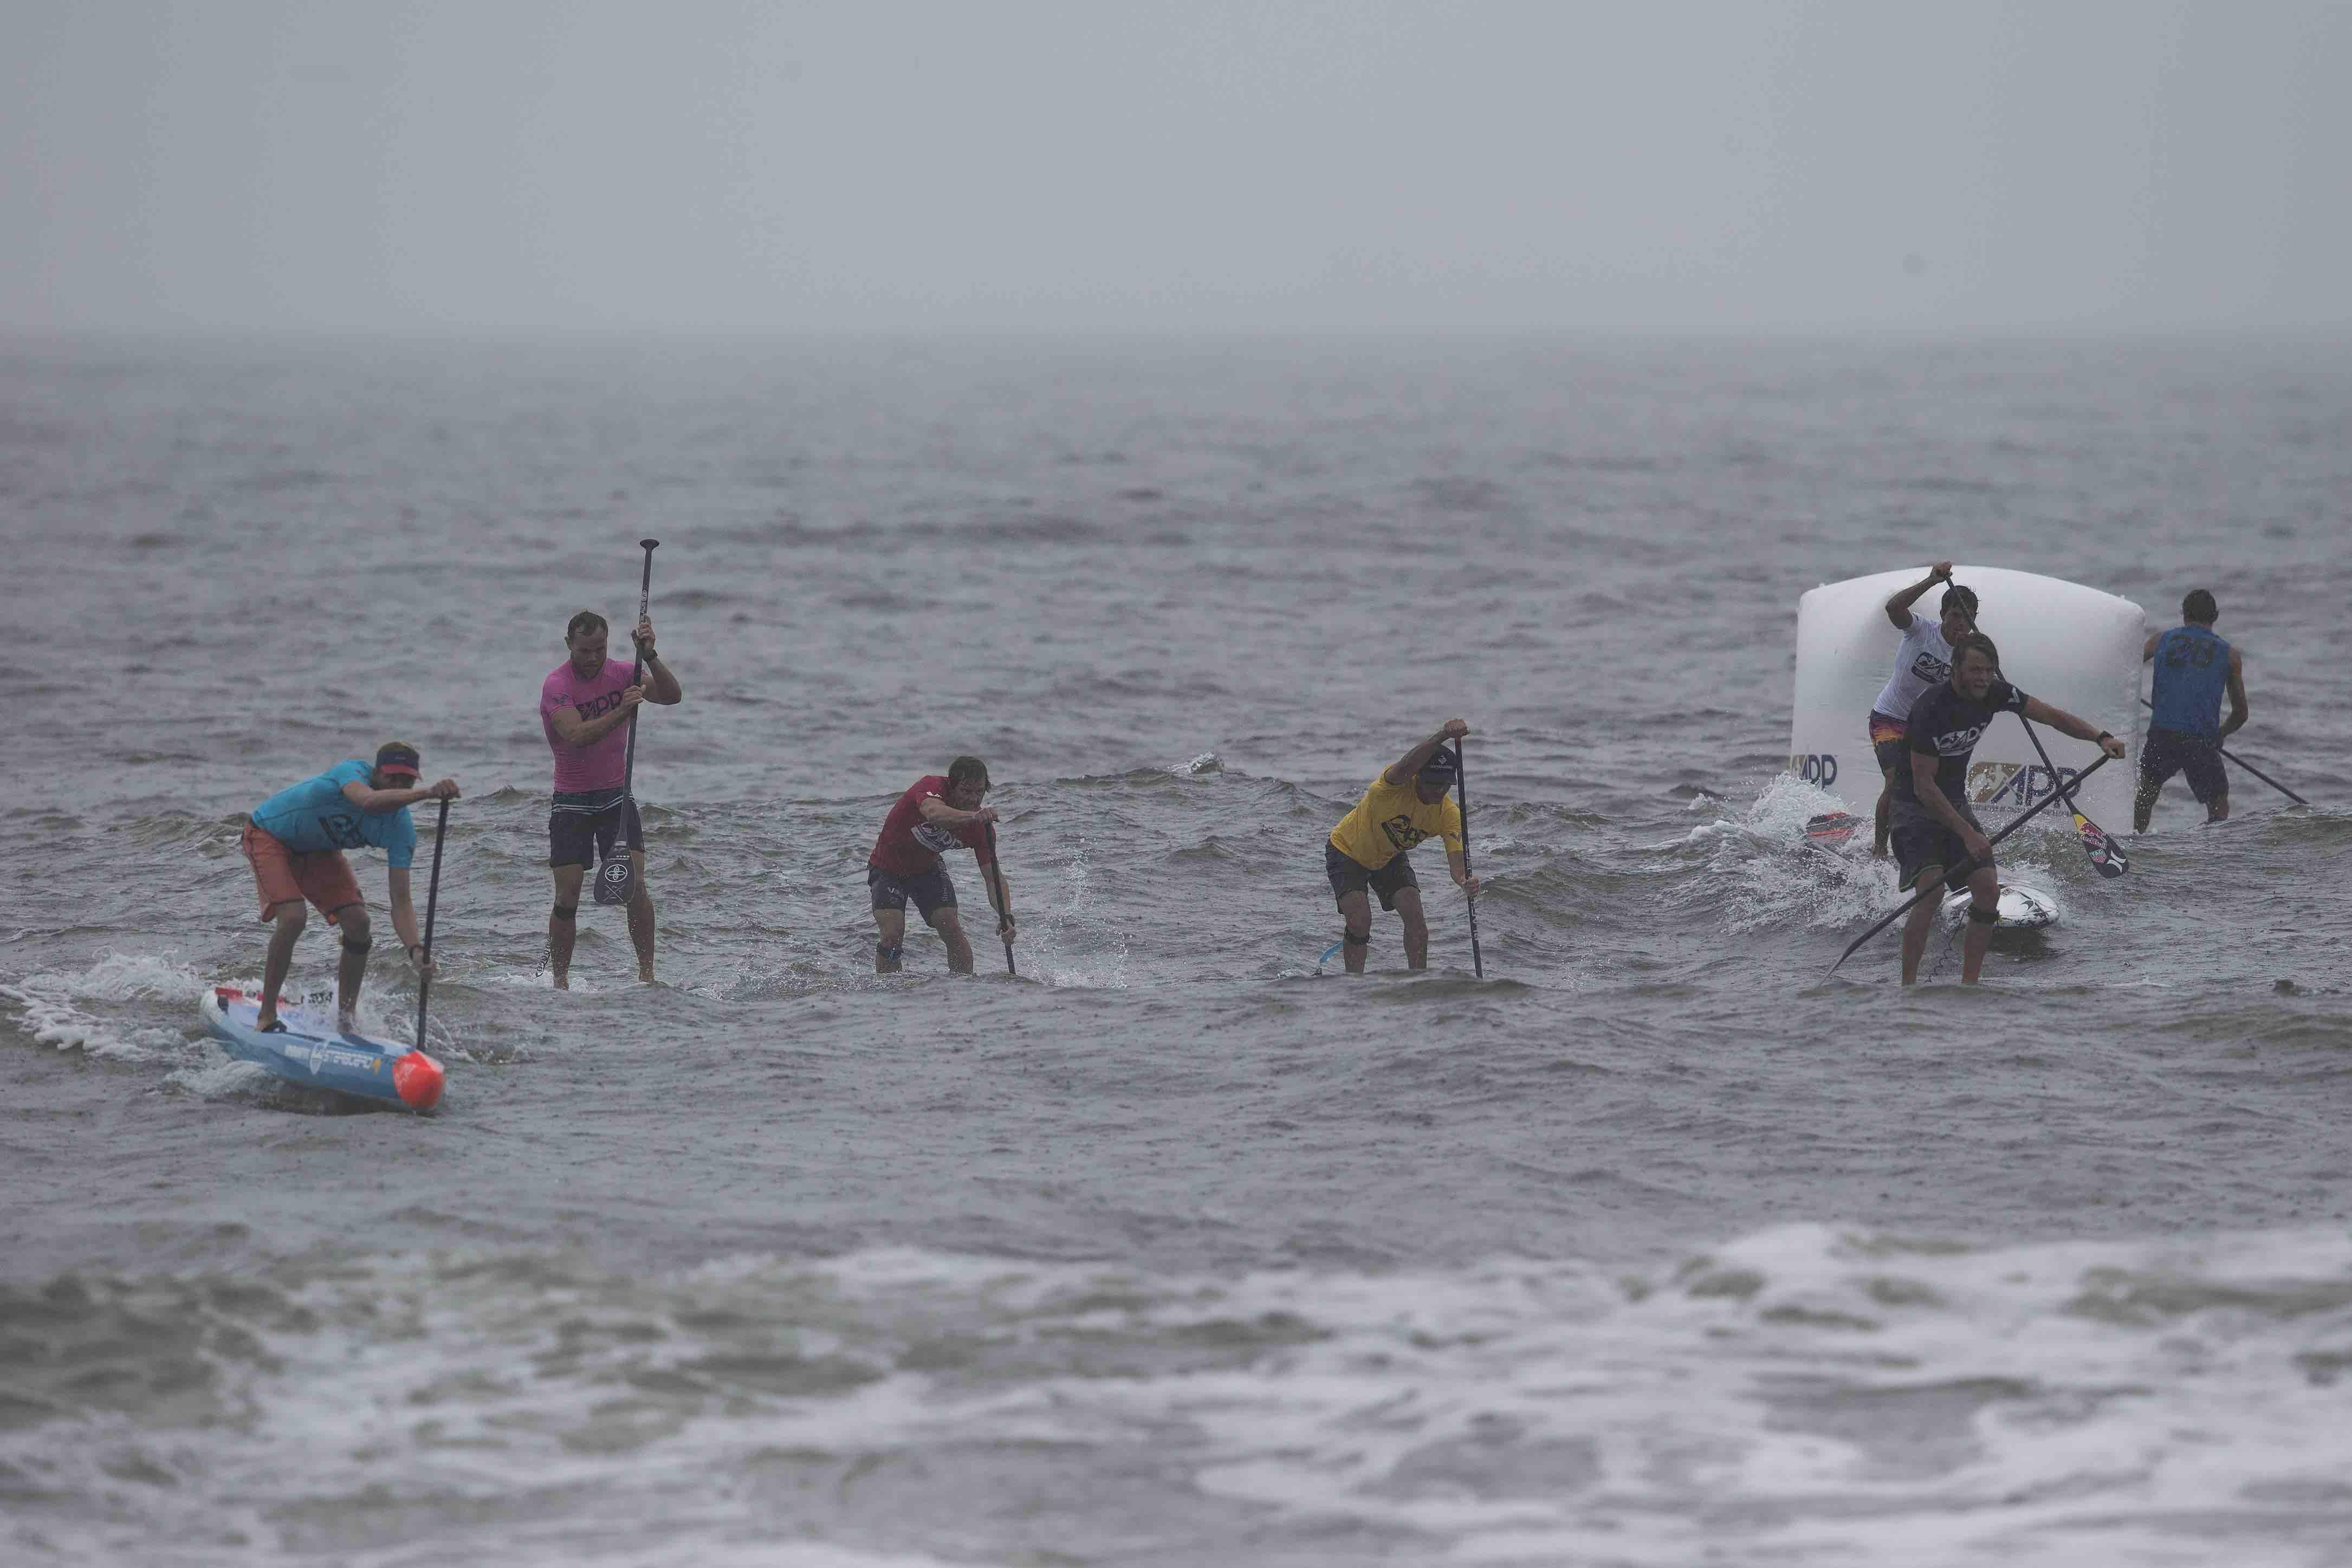 connor-baxter-back-app-2018-ny-sup-open-sprint-beach-race-small-bump